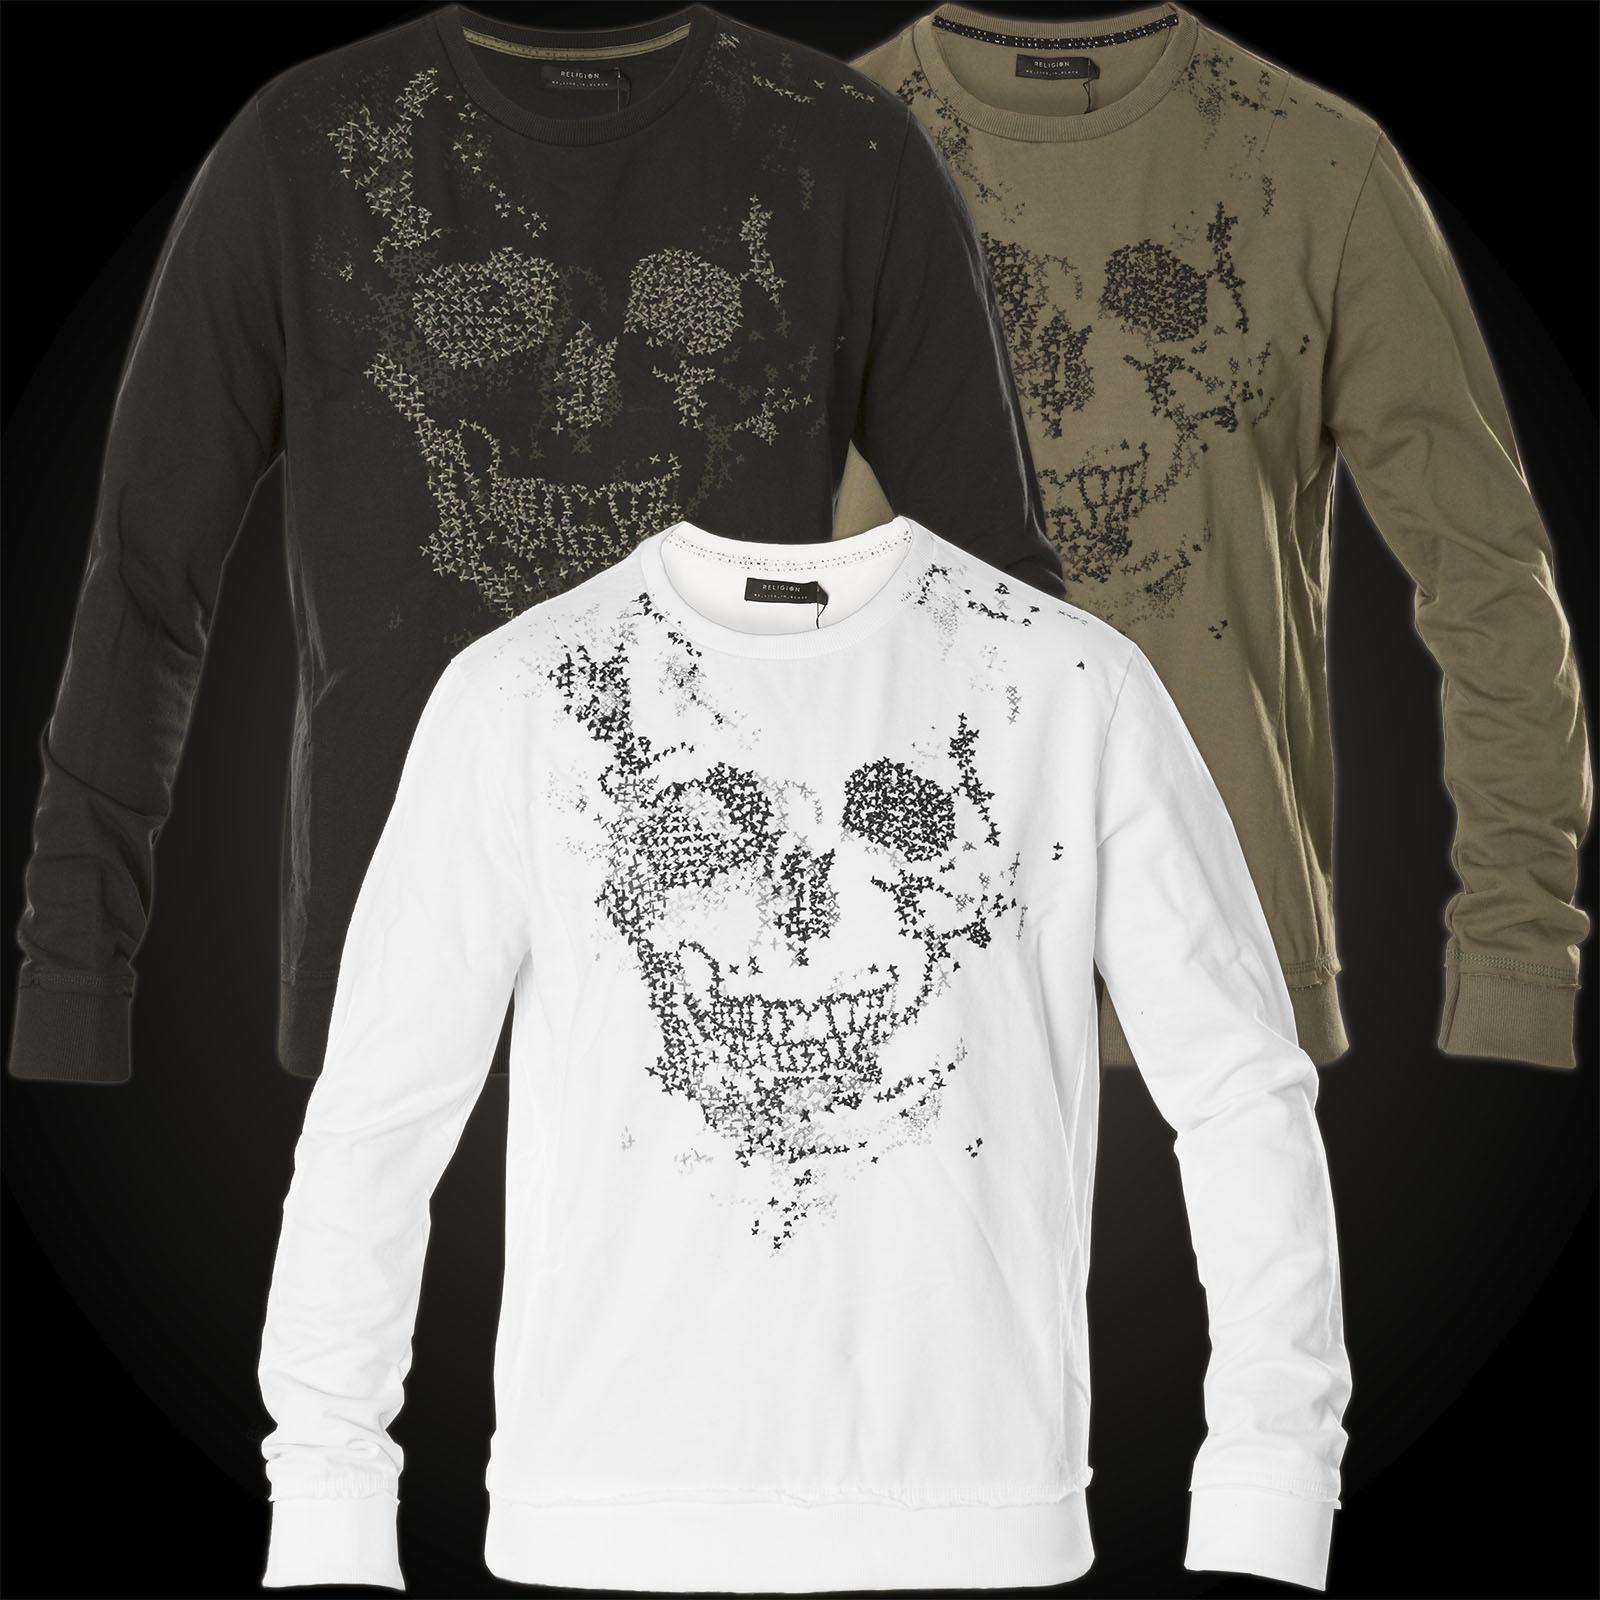 9e1fdfa7af4342 Religion Pullover Skull Stitch MBSSW24 mit Totenkopf Stickerei